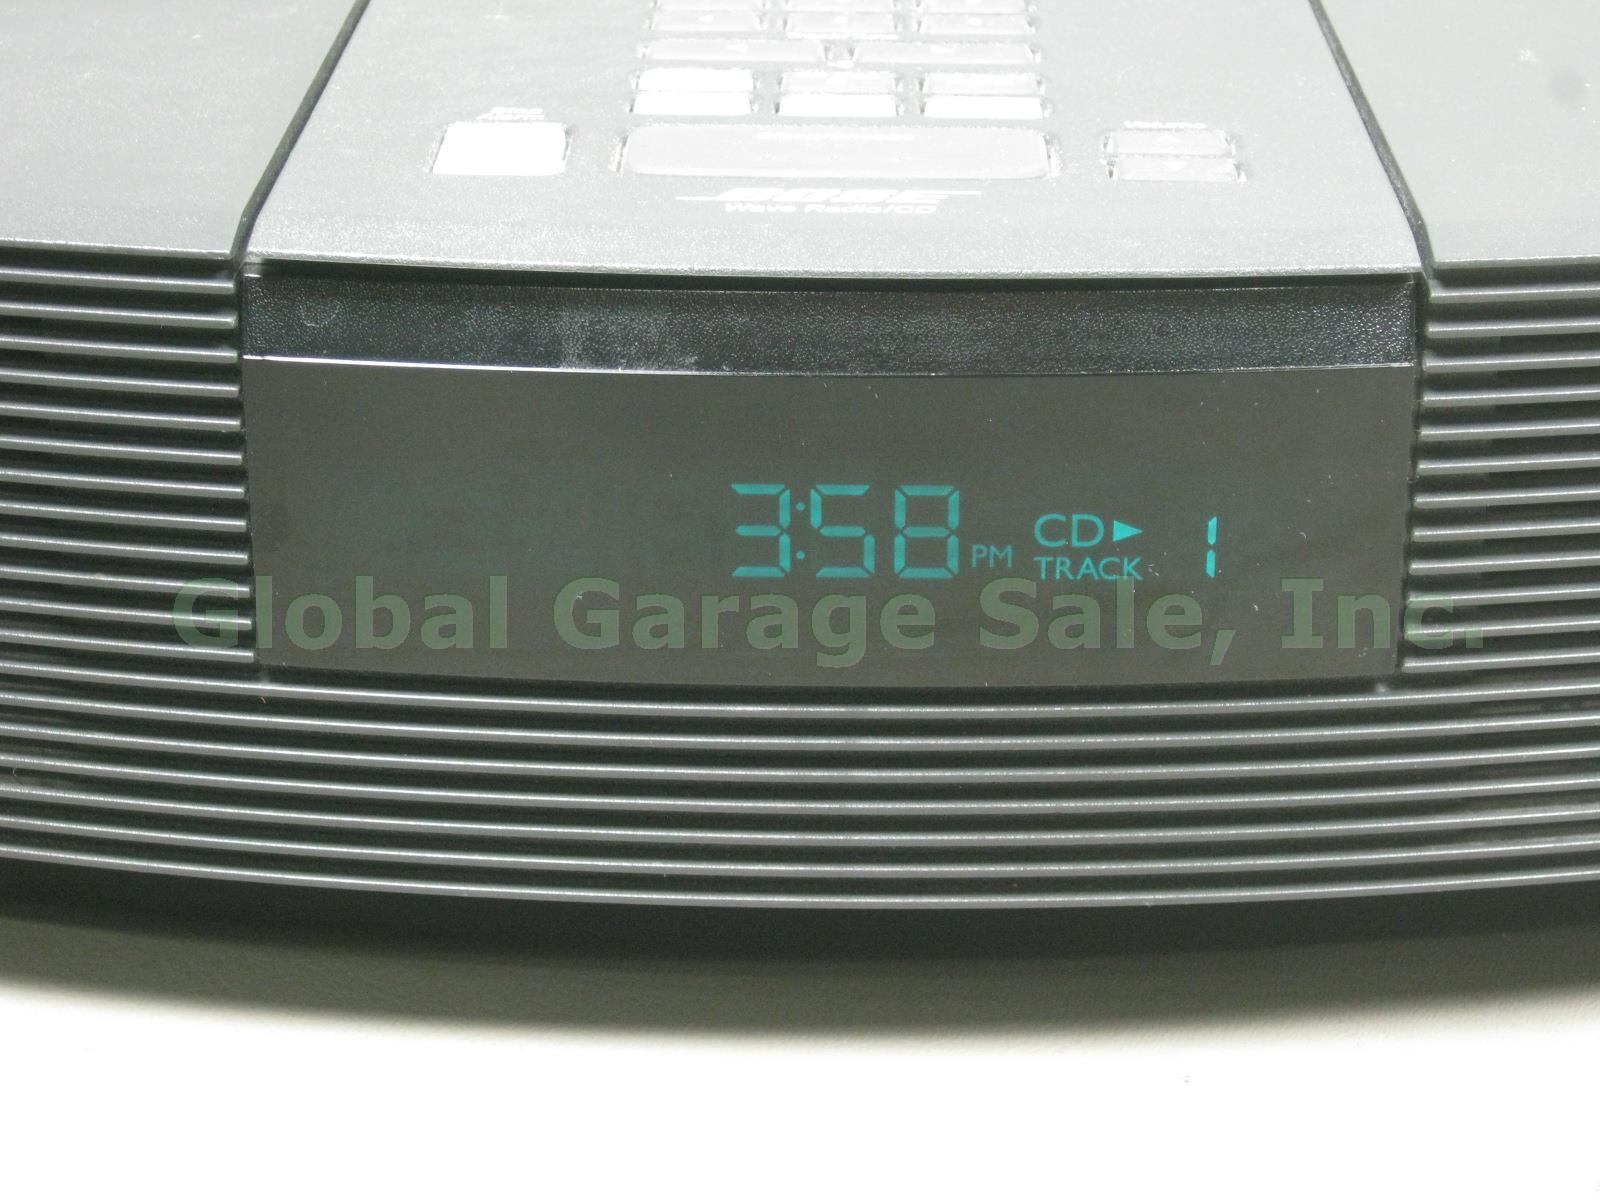 bose wave radio cd player fm am alarm clock in out graphite gray awrc1g remote ebay. Black Bedroom Furniture Sets. Home Design Ideas